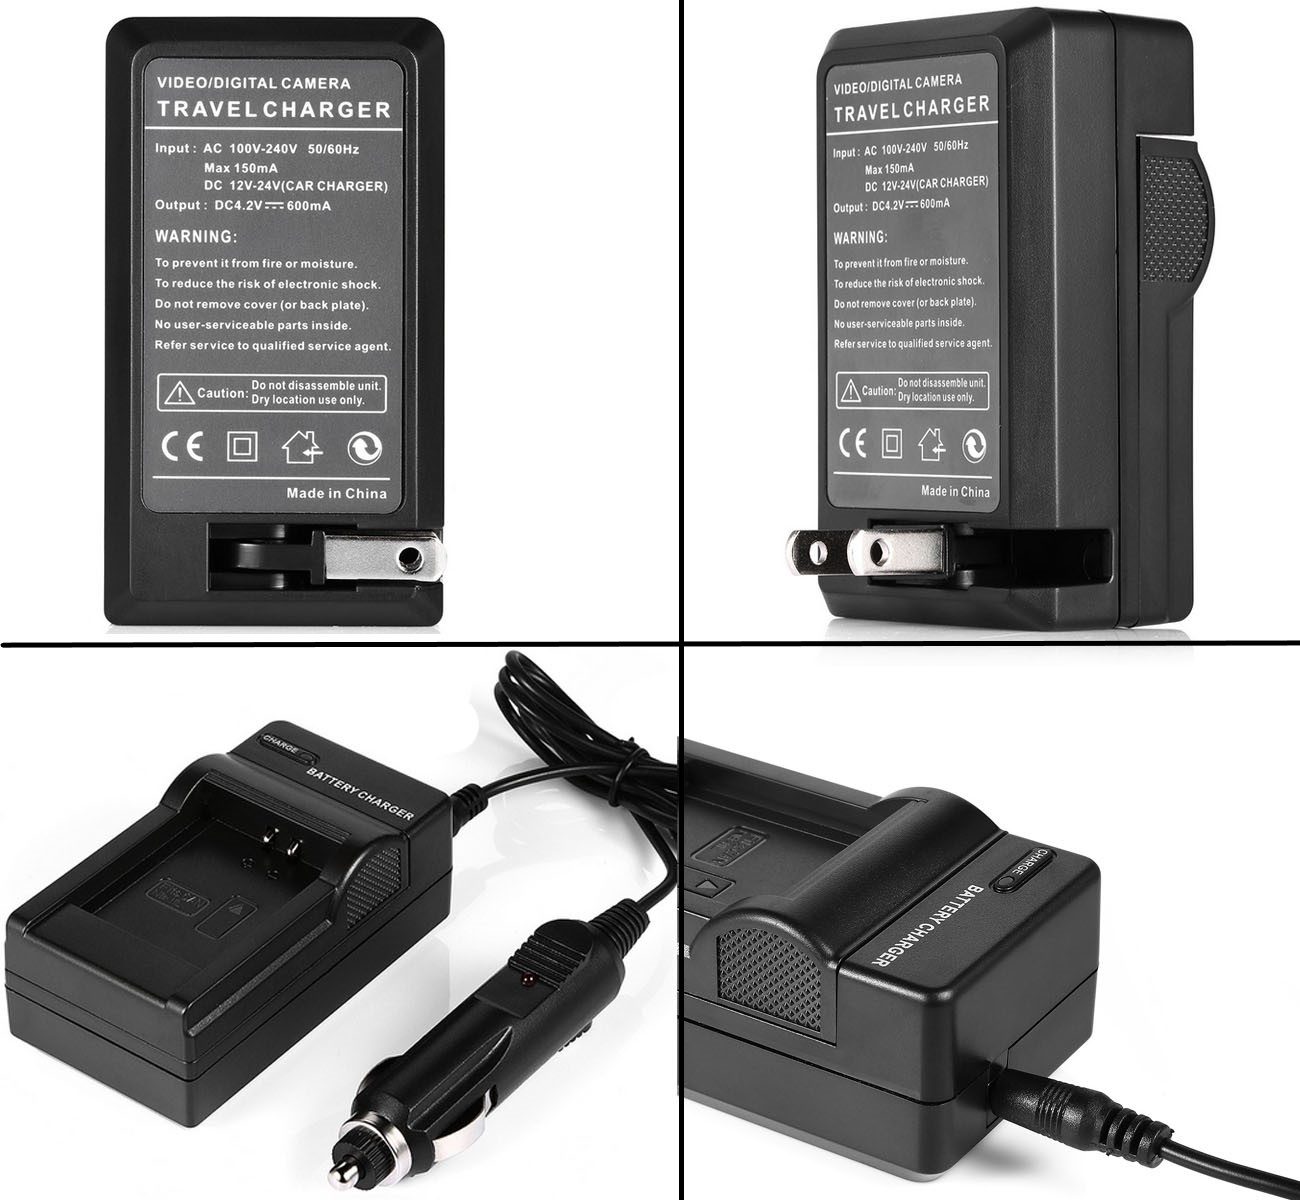 HDR-PJ40VE HDR-PJ40V HDR-PJ30VE HDR-PJ50VE Handycam Camcorder Portable USB Battery Charger for Sony HDR-PJ30V HDR-PJ50V